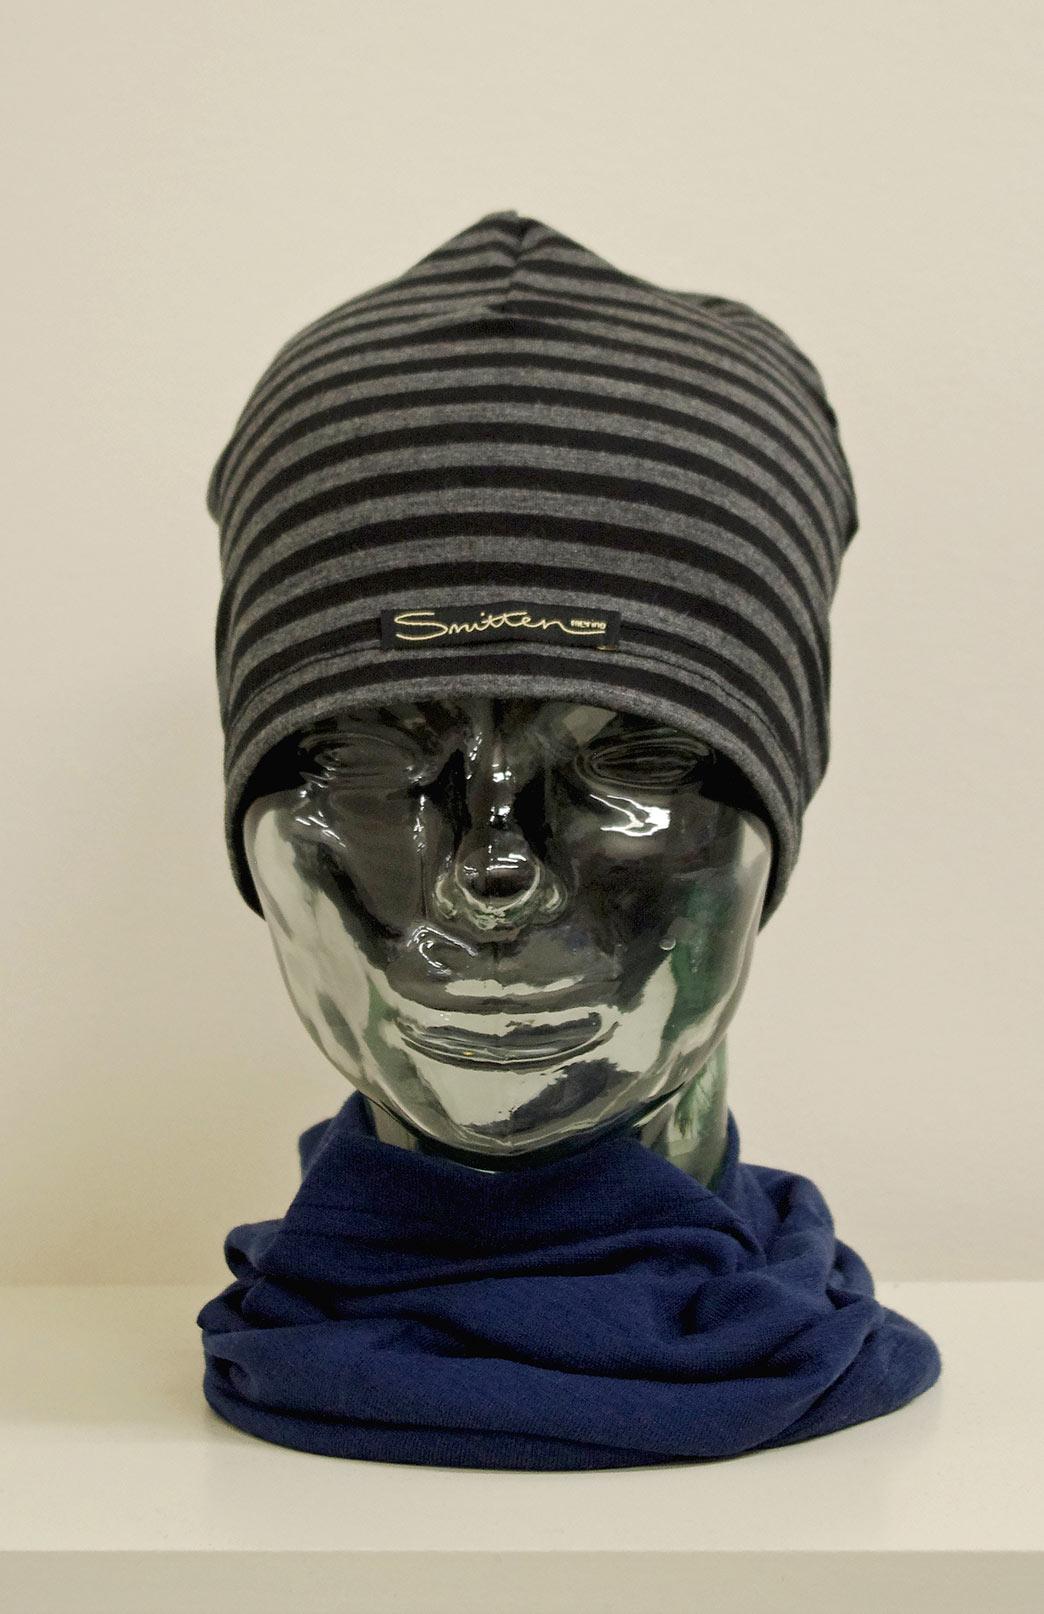 Beanie -- Patterned - Black & Grey Stripe Patterned Merino Wool Unisex Beanie - Smitten Merino Tasmania Australia